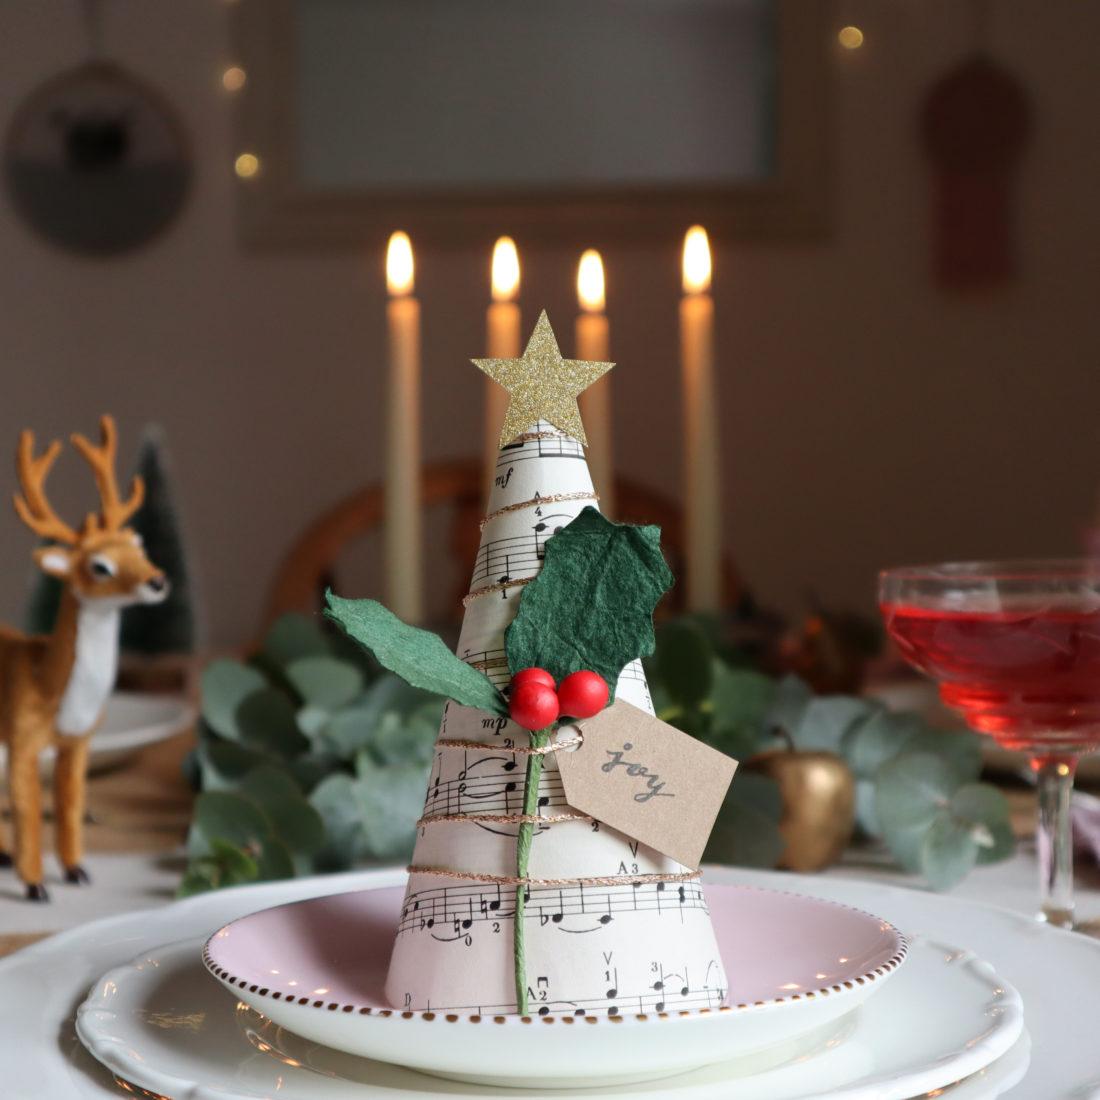 decorazioni-natalizie-carta-tavola